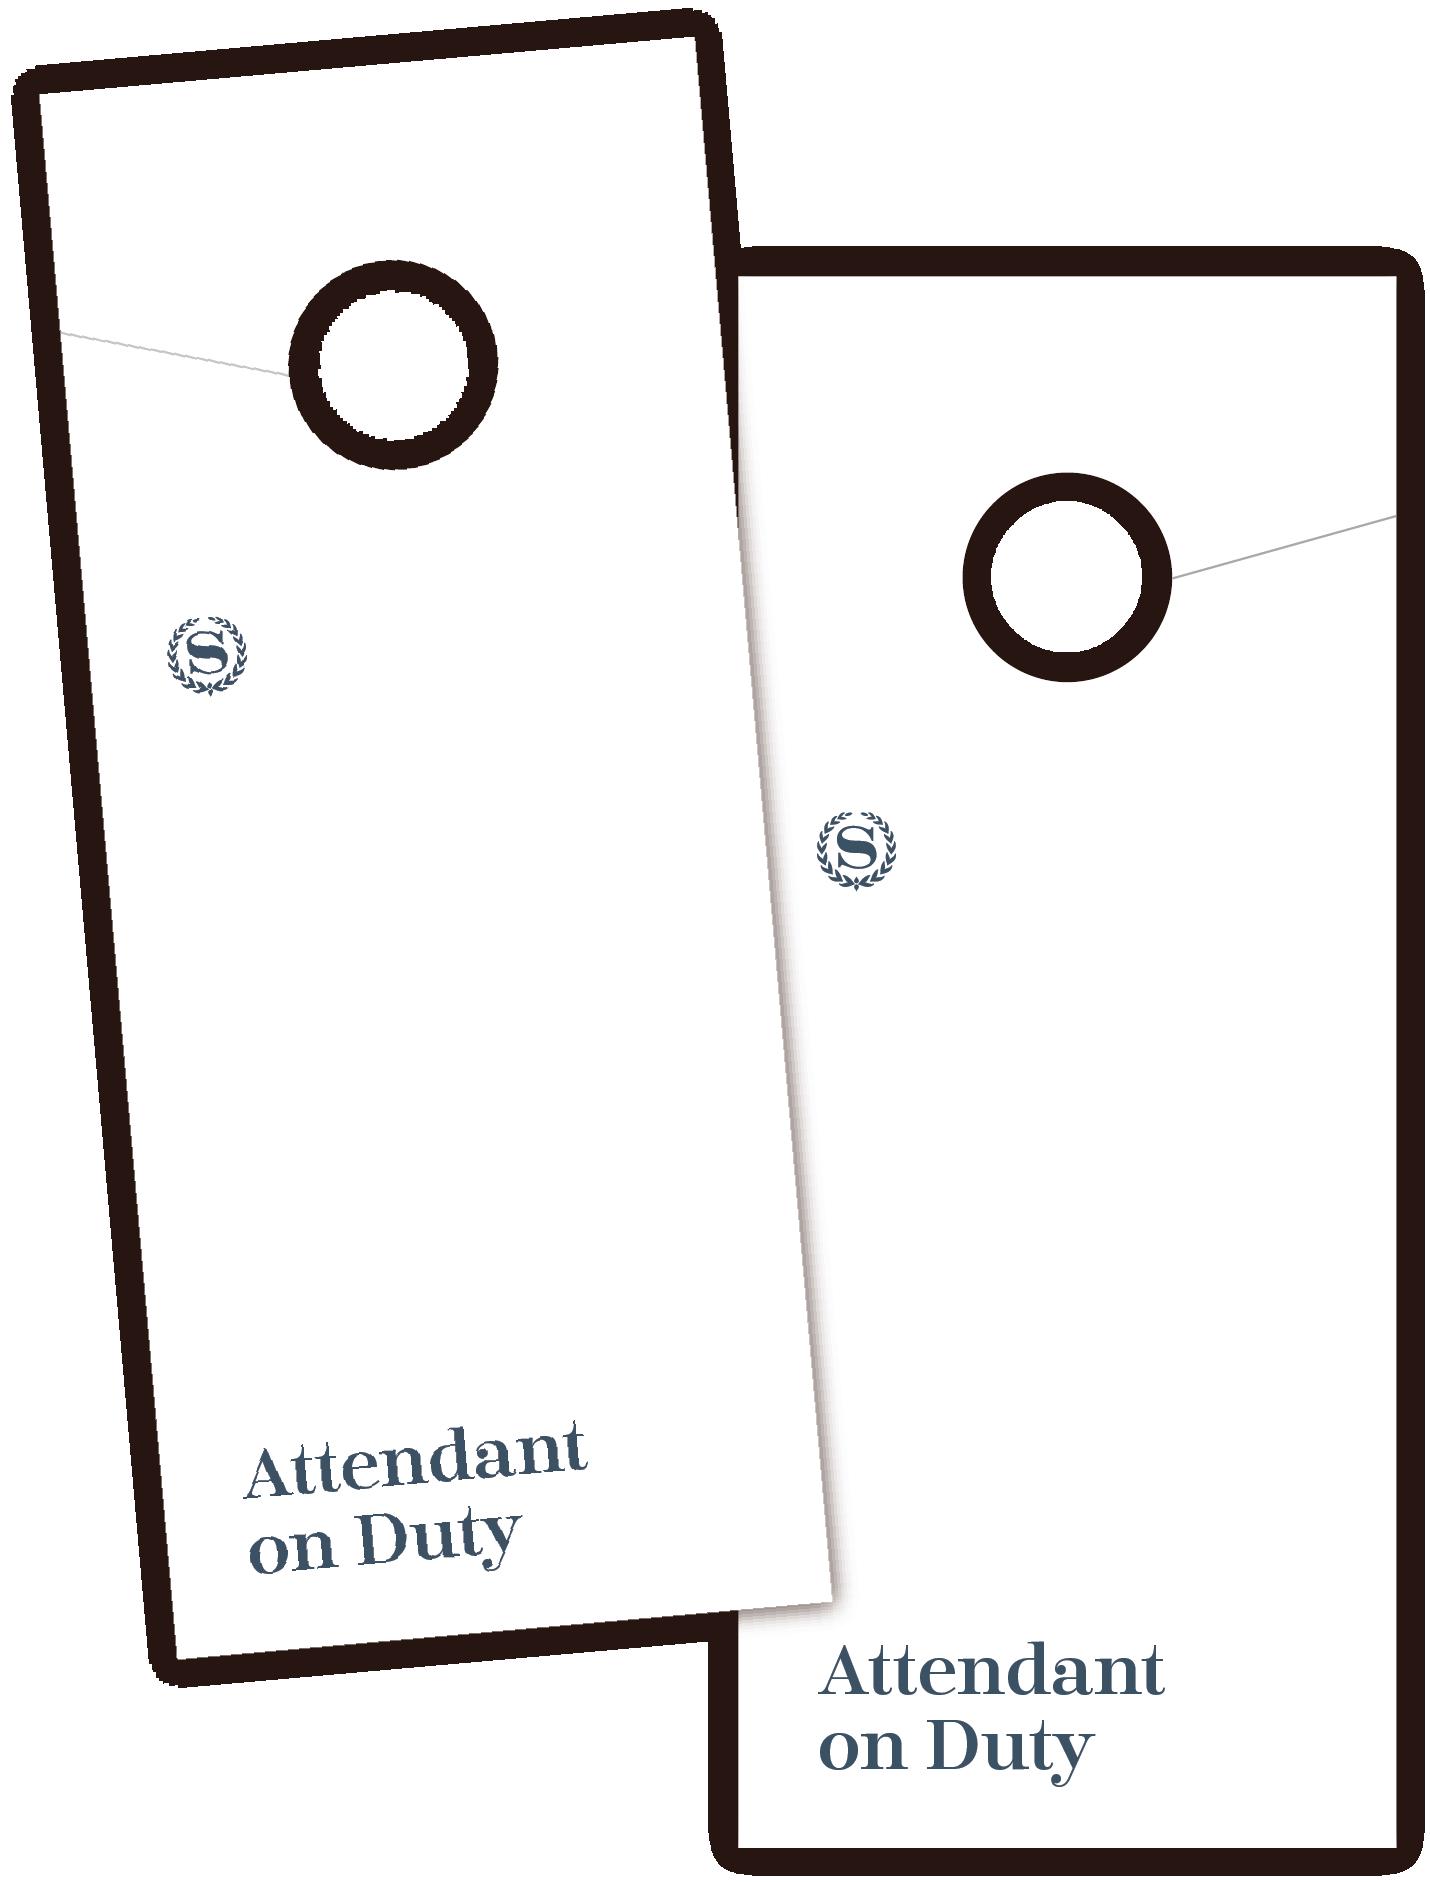 Sheraton Attendant-on-Duty Door Hanger